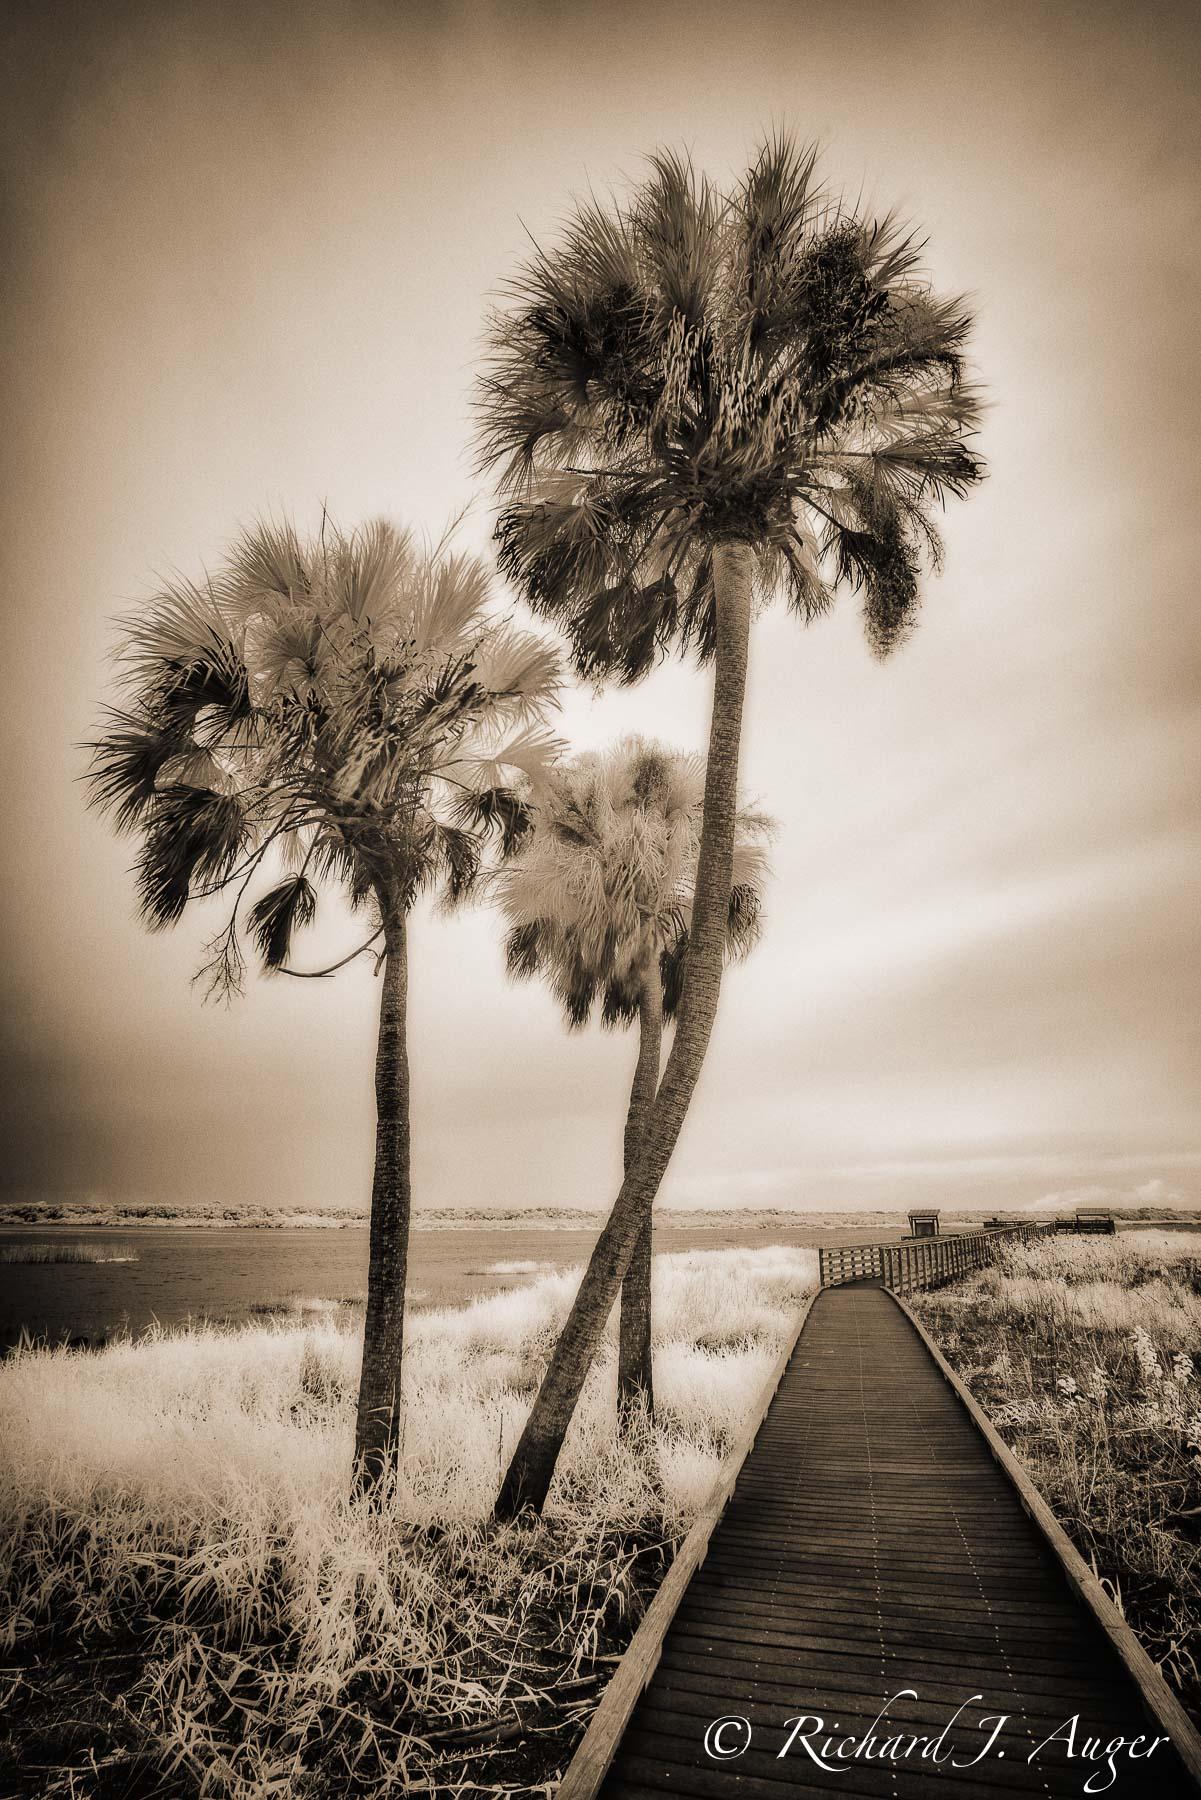 Myakka River State Park, Florida, Palm Trees, Walkway, swamp, infrared, photographer, landscape, sepia tone, monochrome